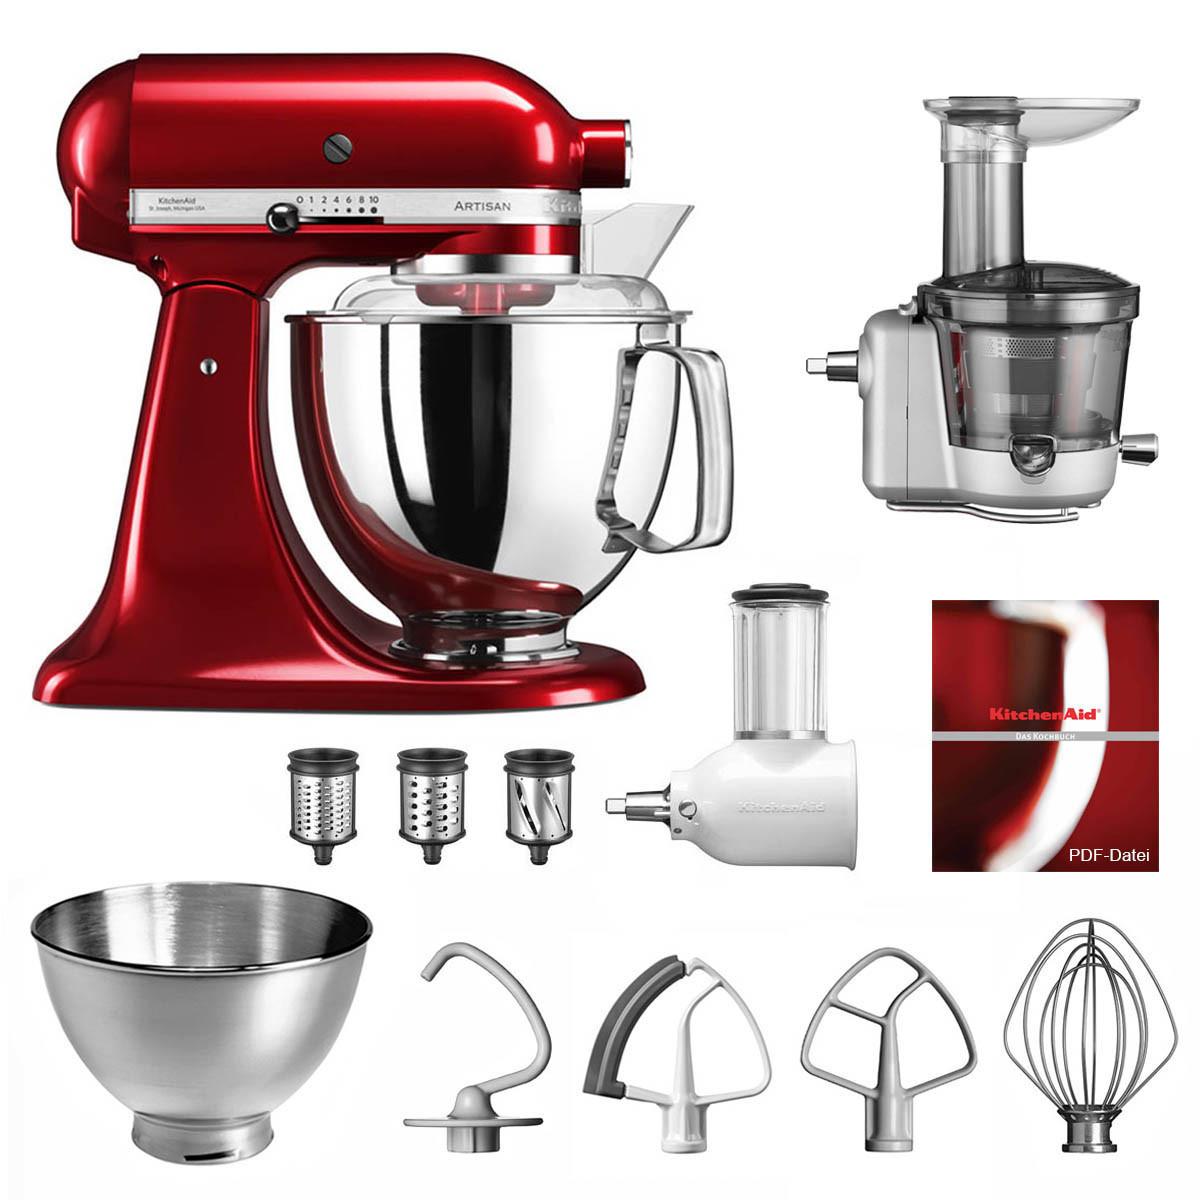 KitchenAid Küchenmaschine 5KSM175PS Entsafter Vital-Set liebesapfelrot